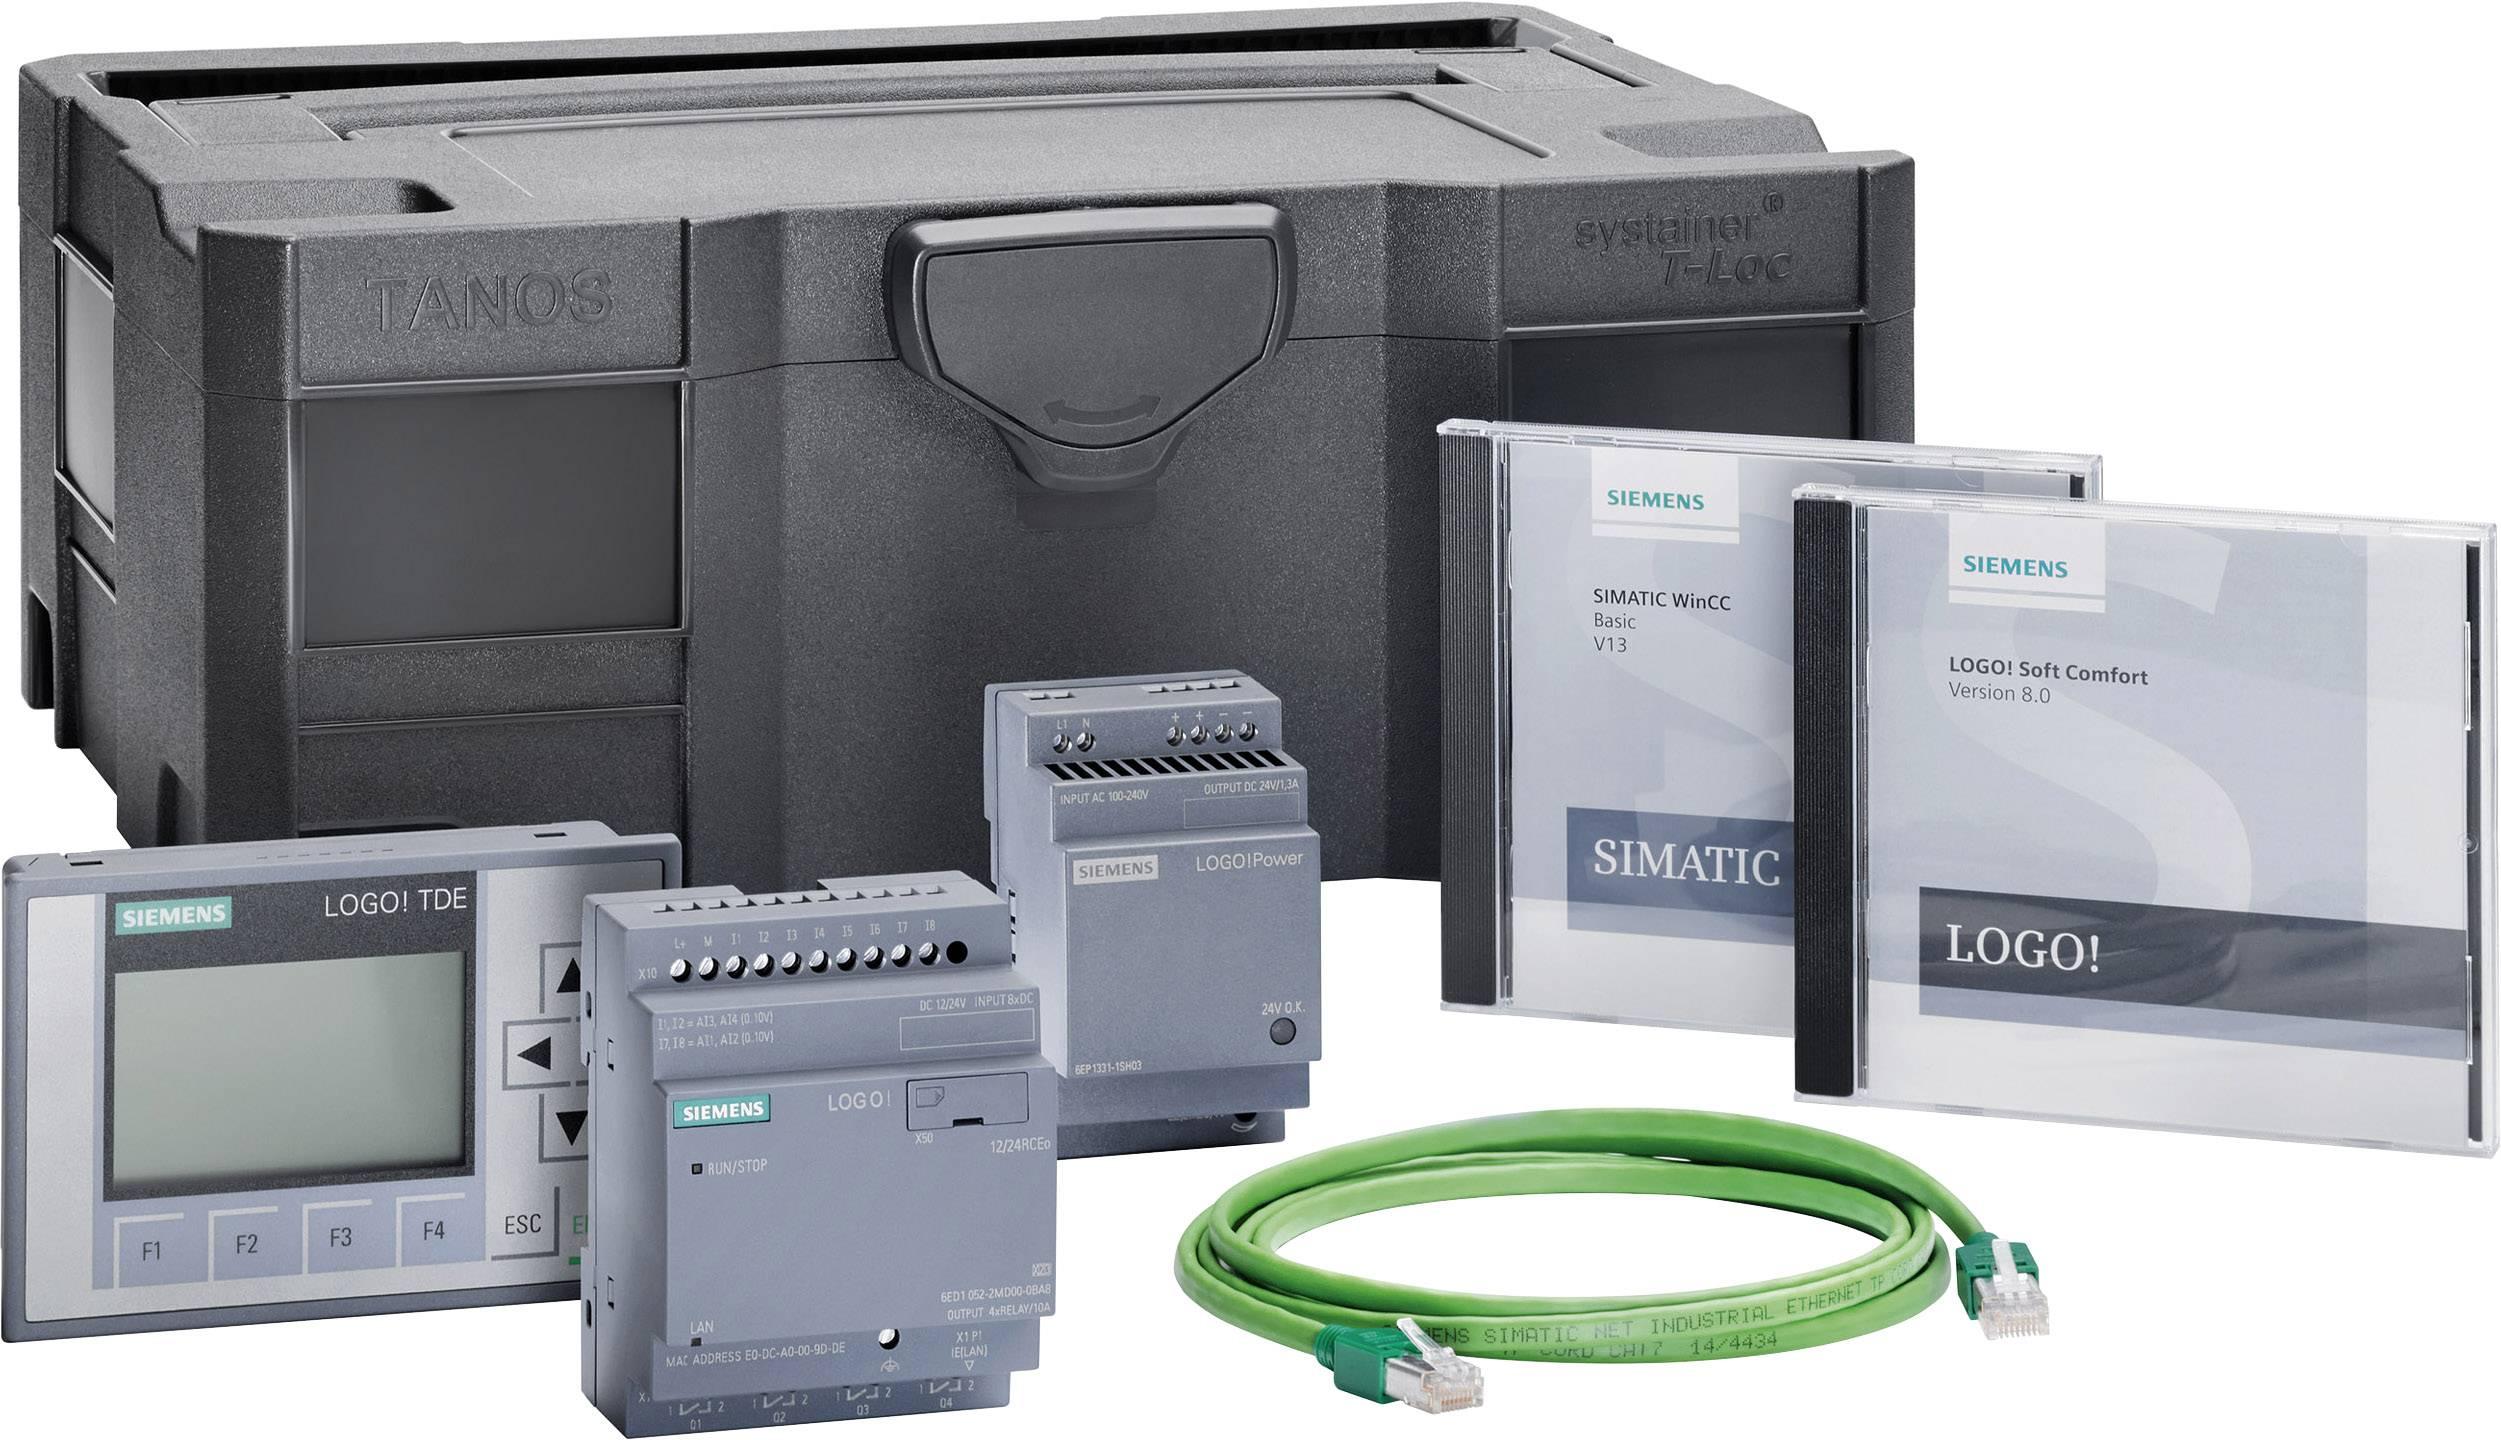 Štartovacia súprava Siemens LOGO! TD STARTER KIT 12/24V 6ED1057-3BA11-0AA8